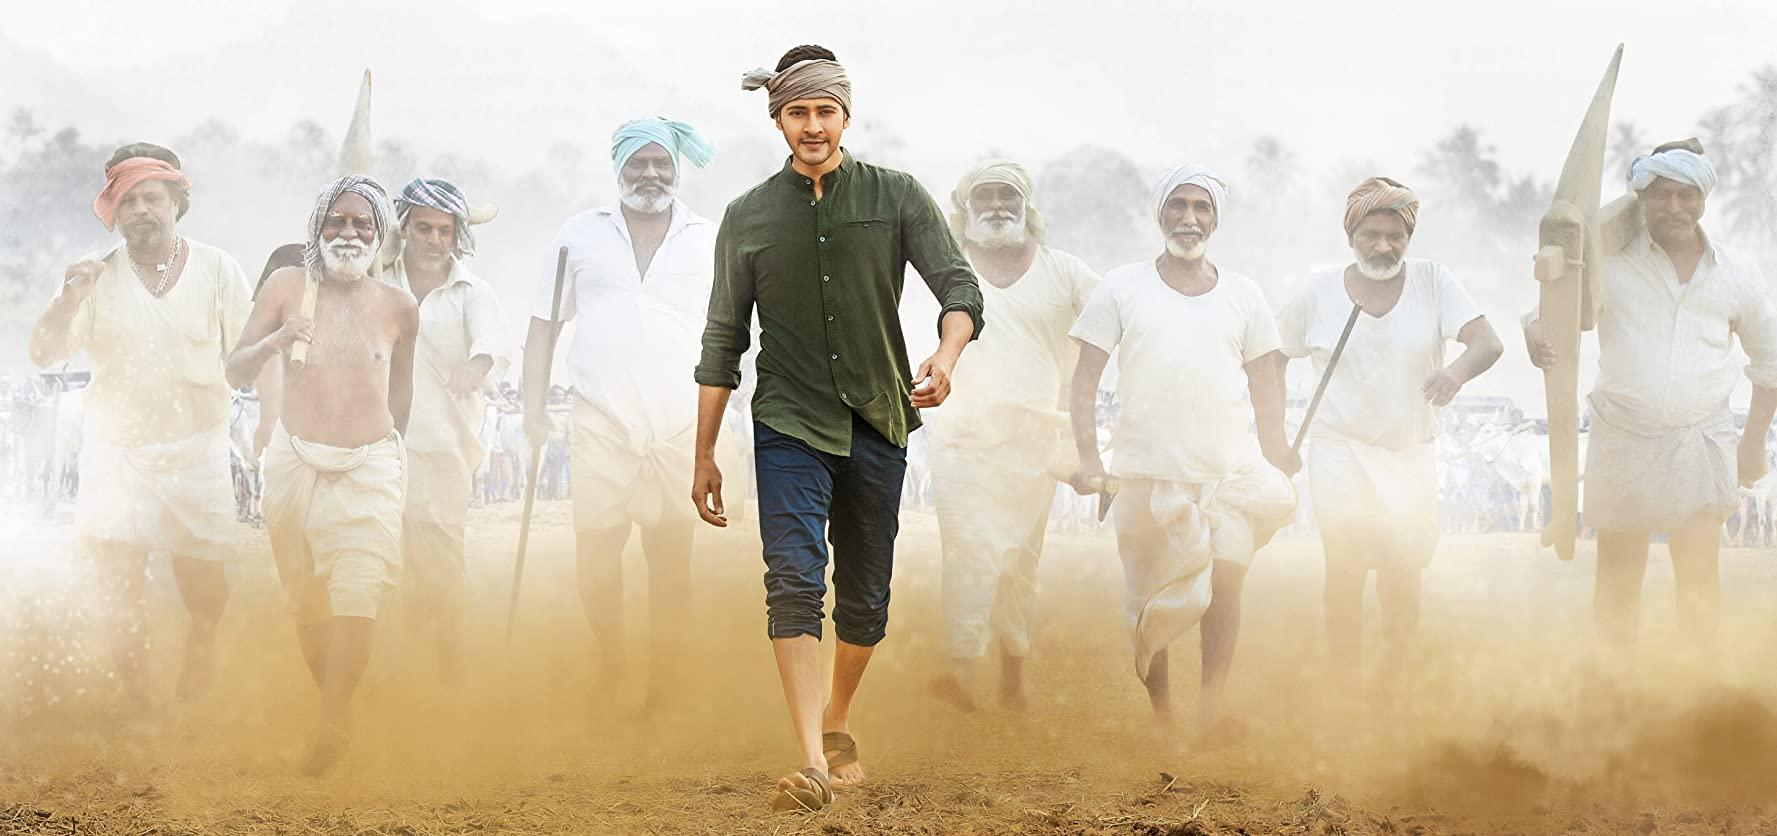 مشاهدة فيلم Maharshi (2019) مترجم HD اون لاين